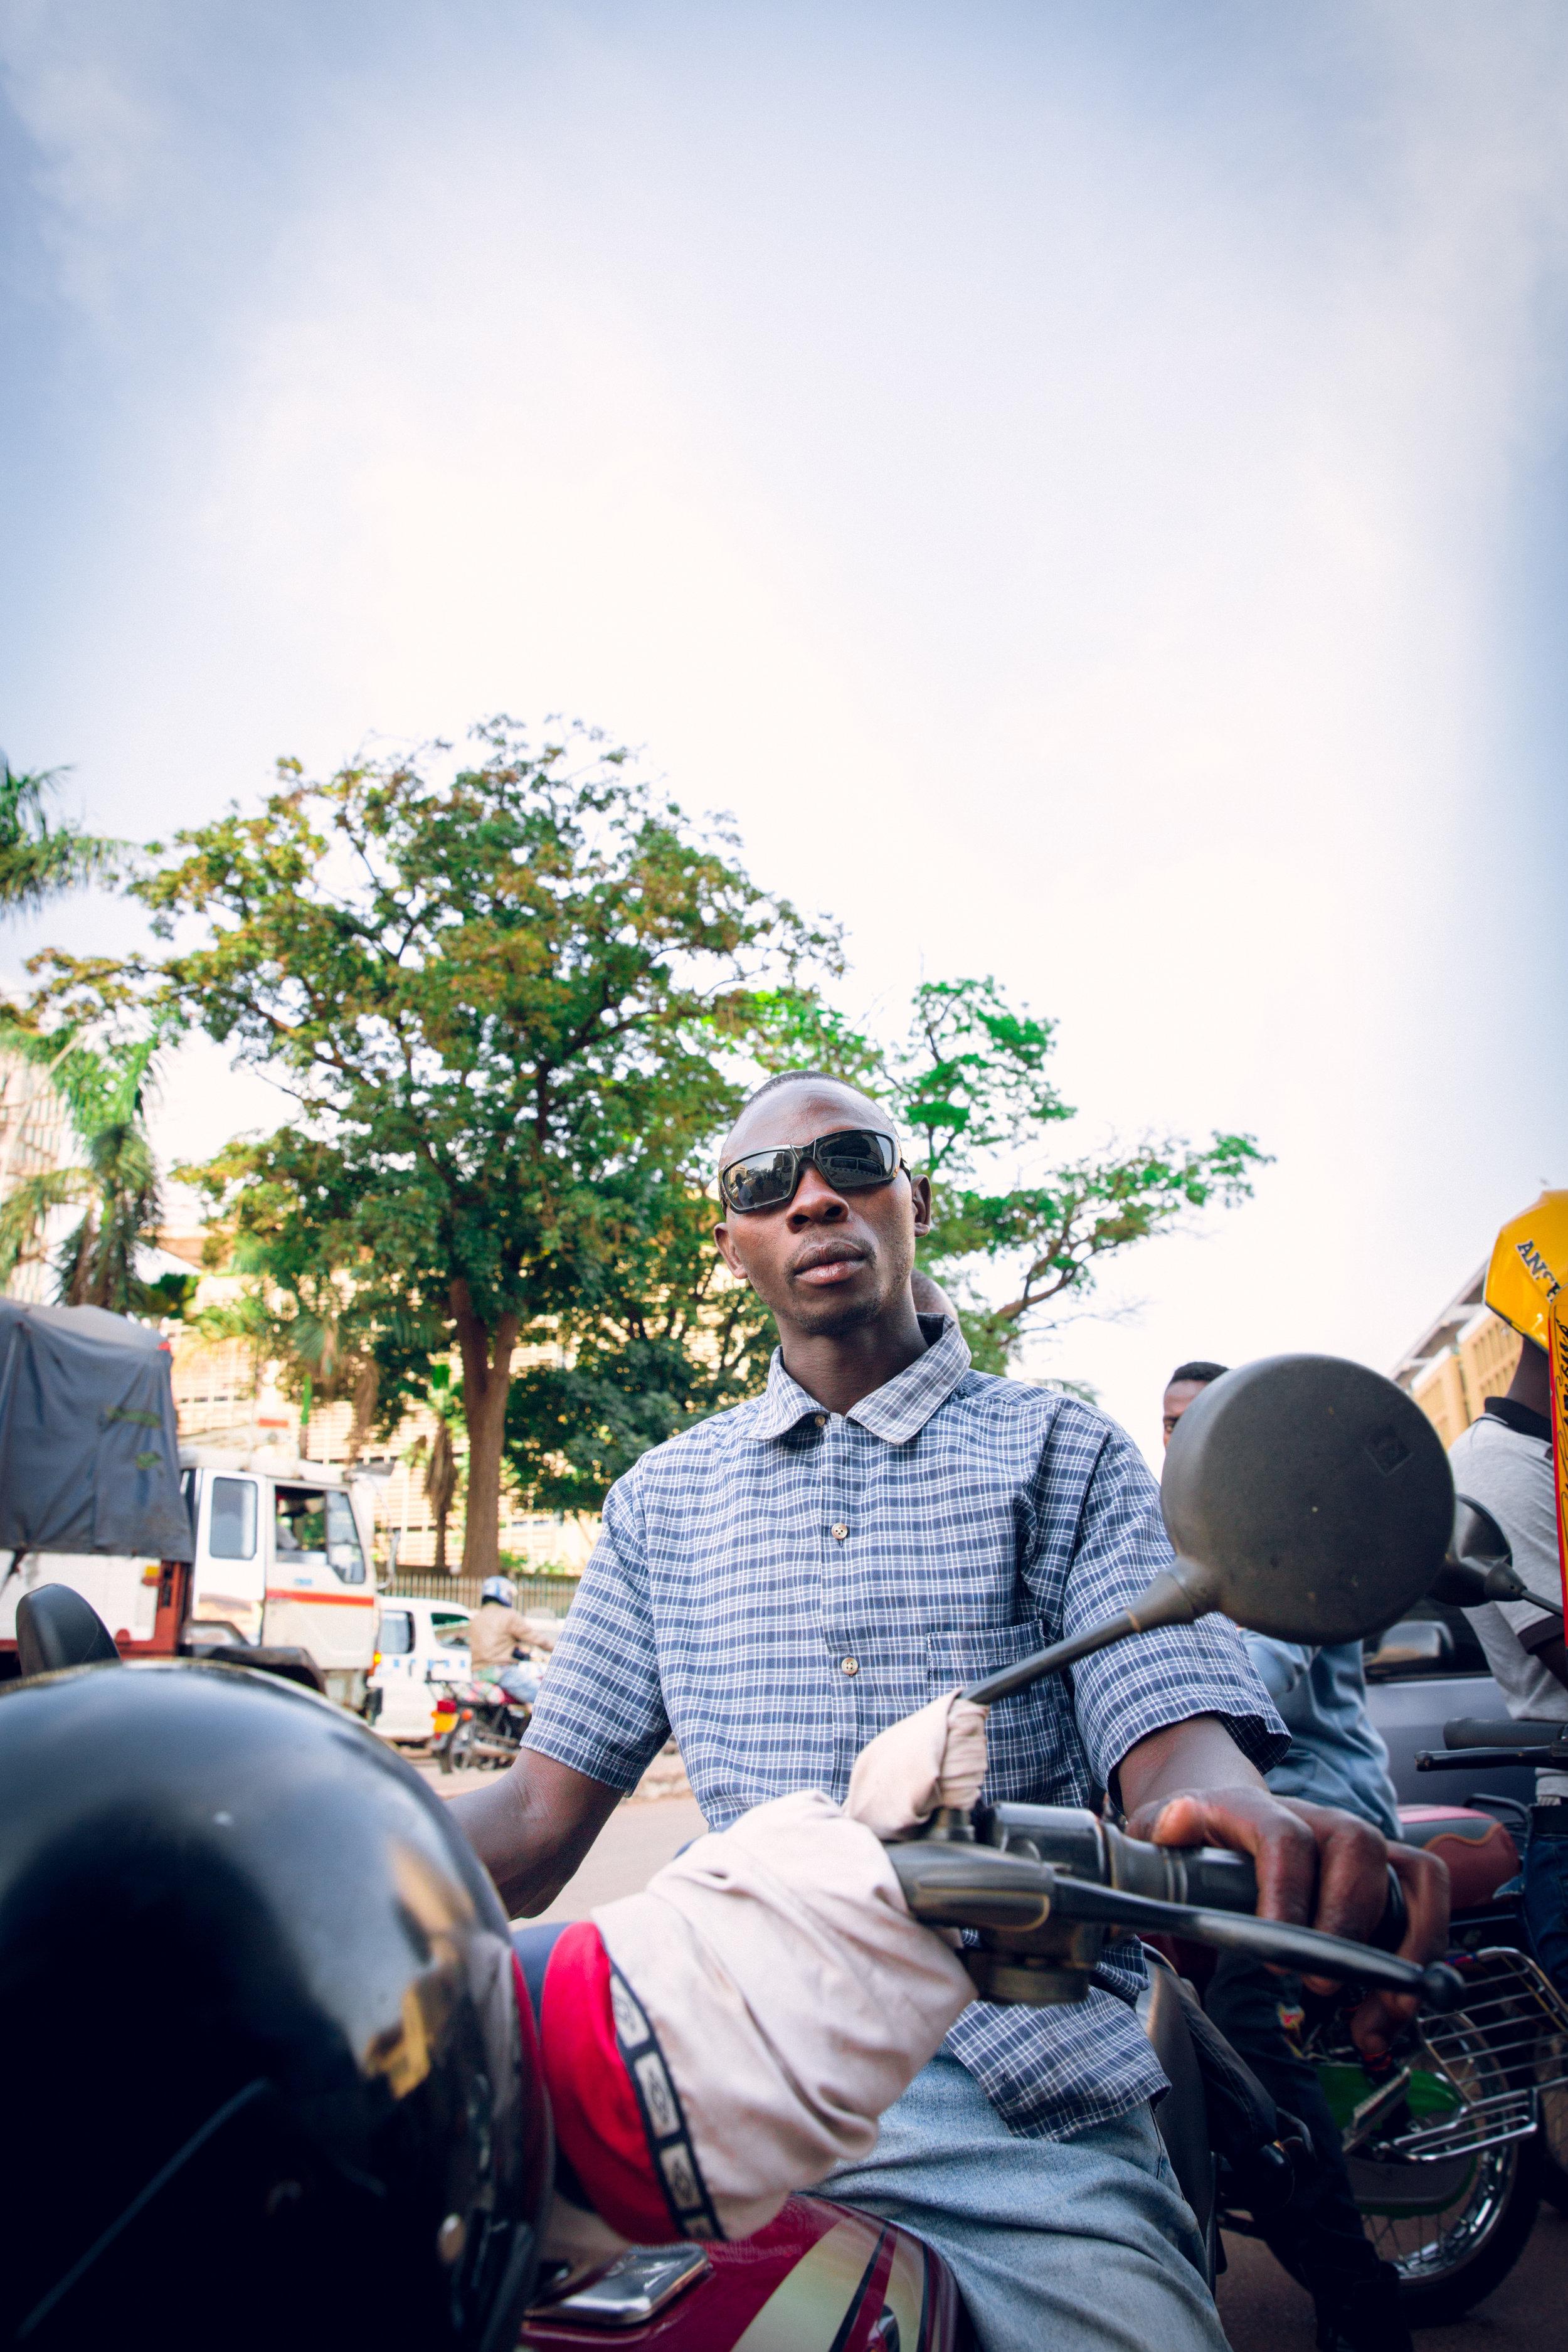 UgandaDay5StreetPhotos-17.jpg